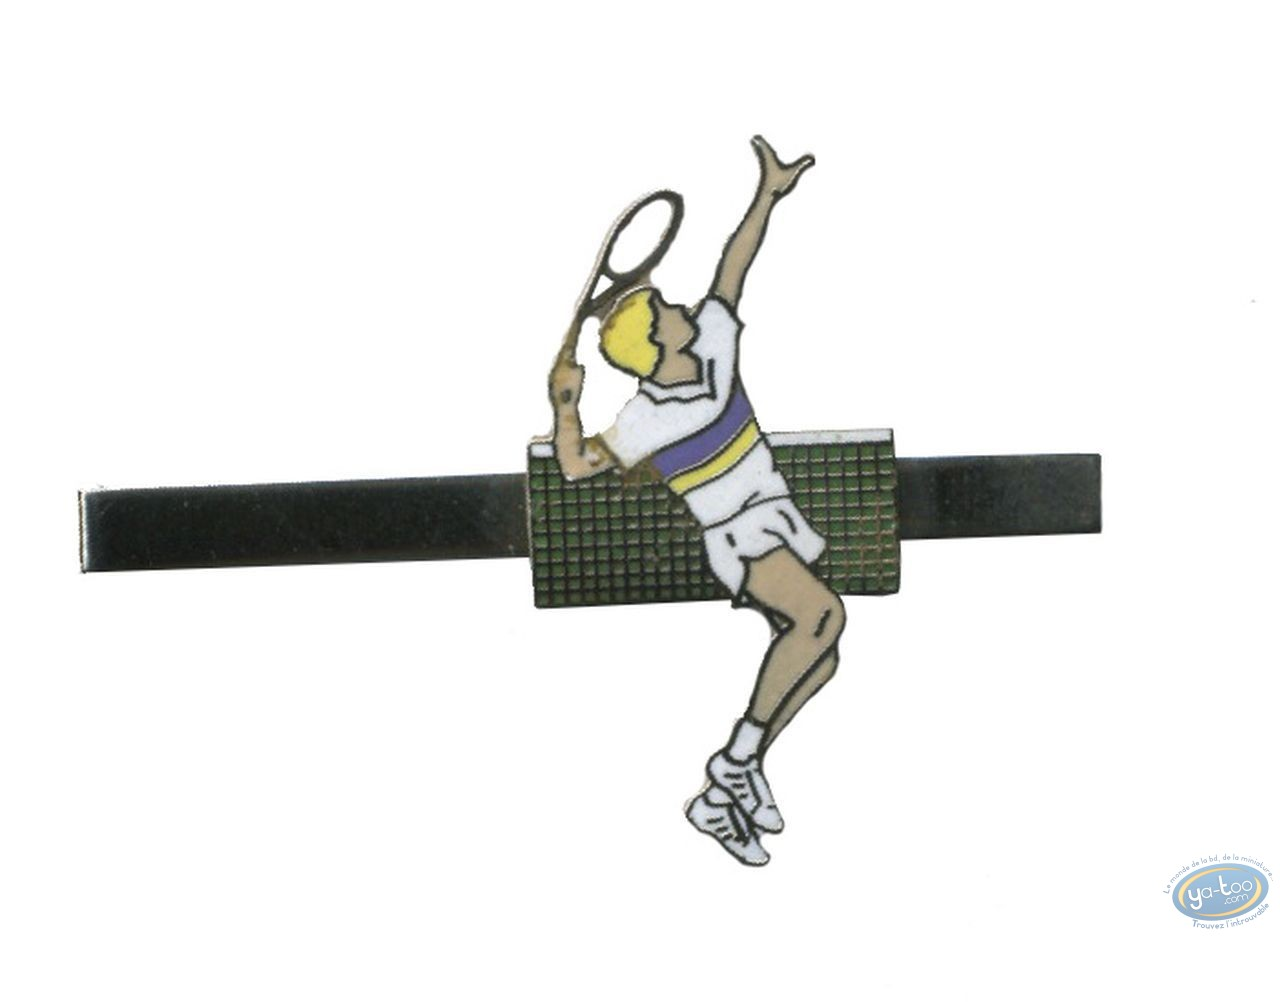 Clothes, Tennis player - tie bar